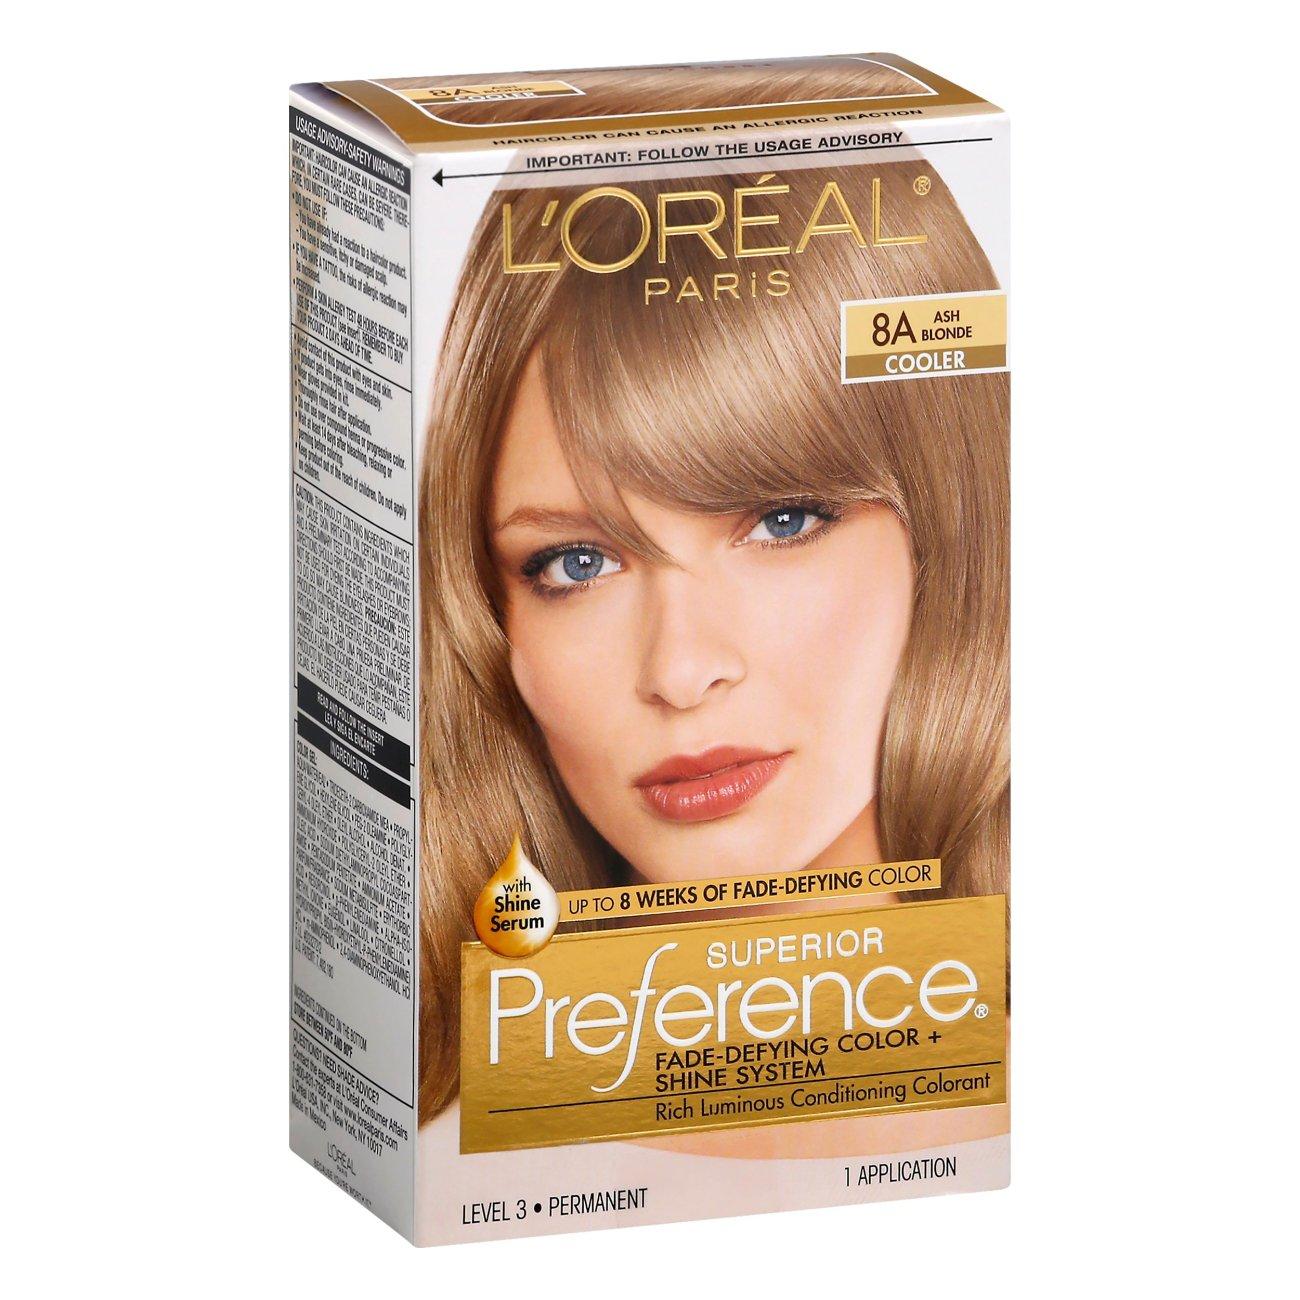 L Oreal Paris Superior Preference Permanent Hair Color 8a Ash Blonde Shop Hair Color At H E B